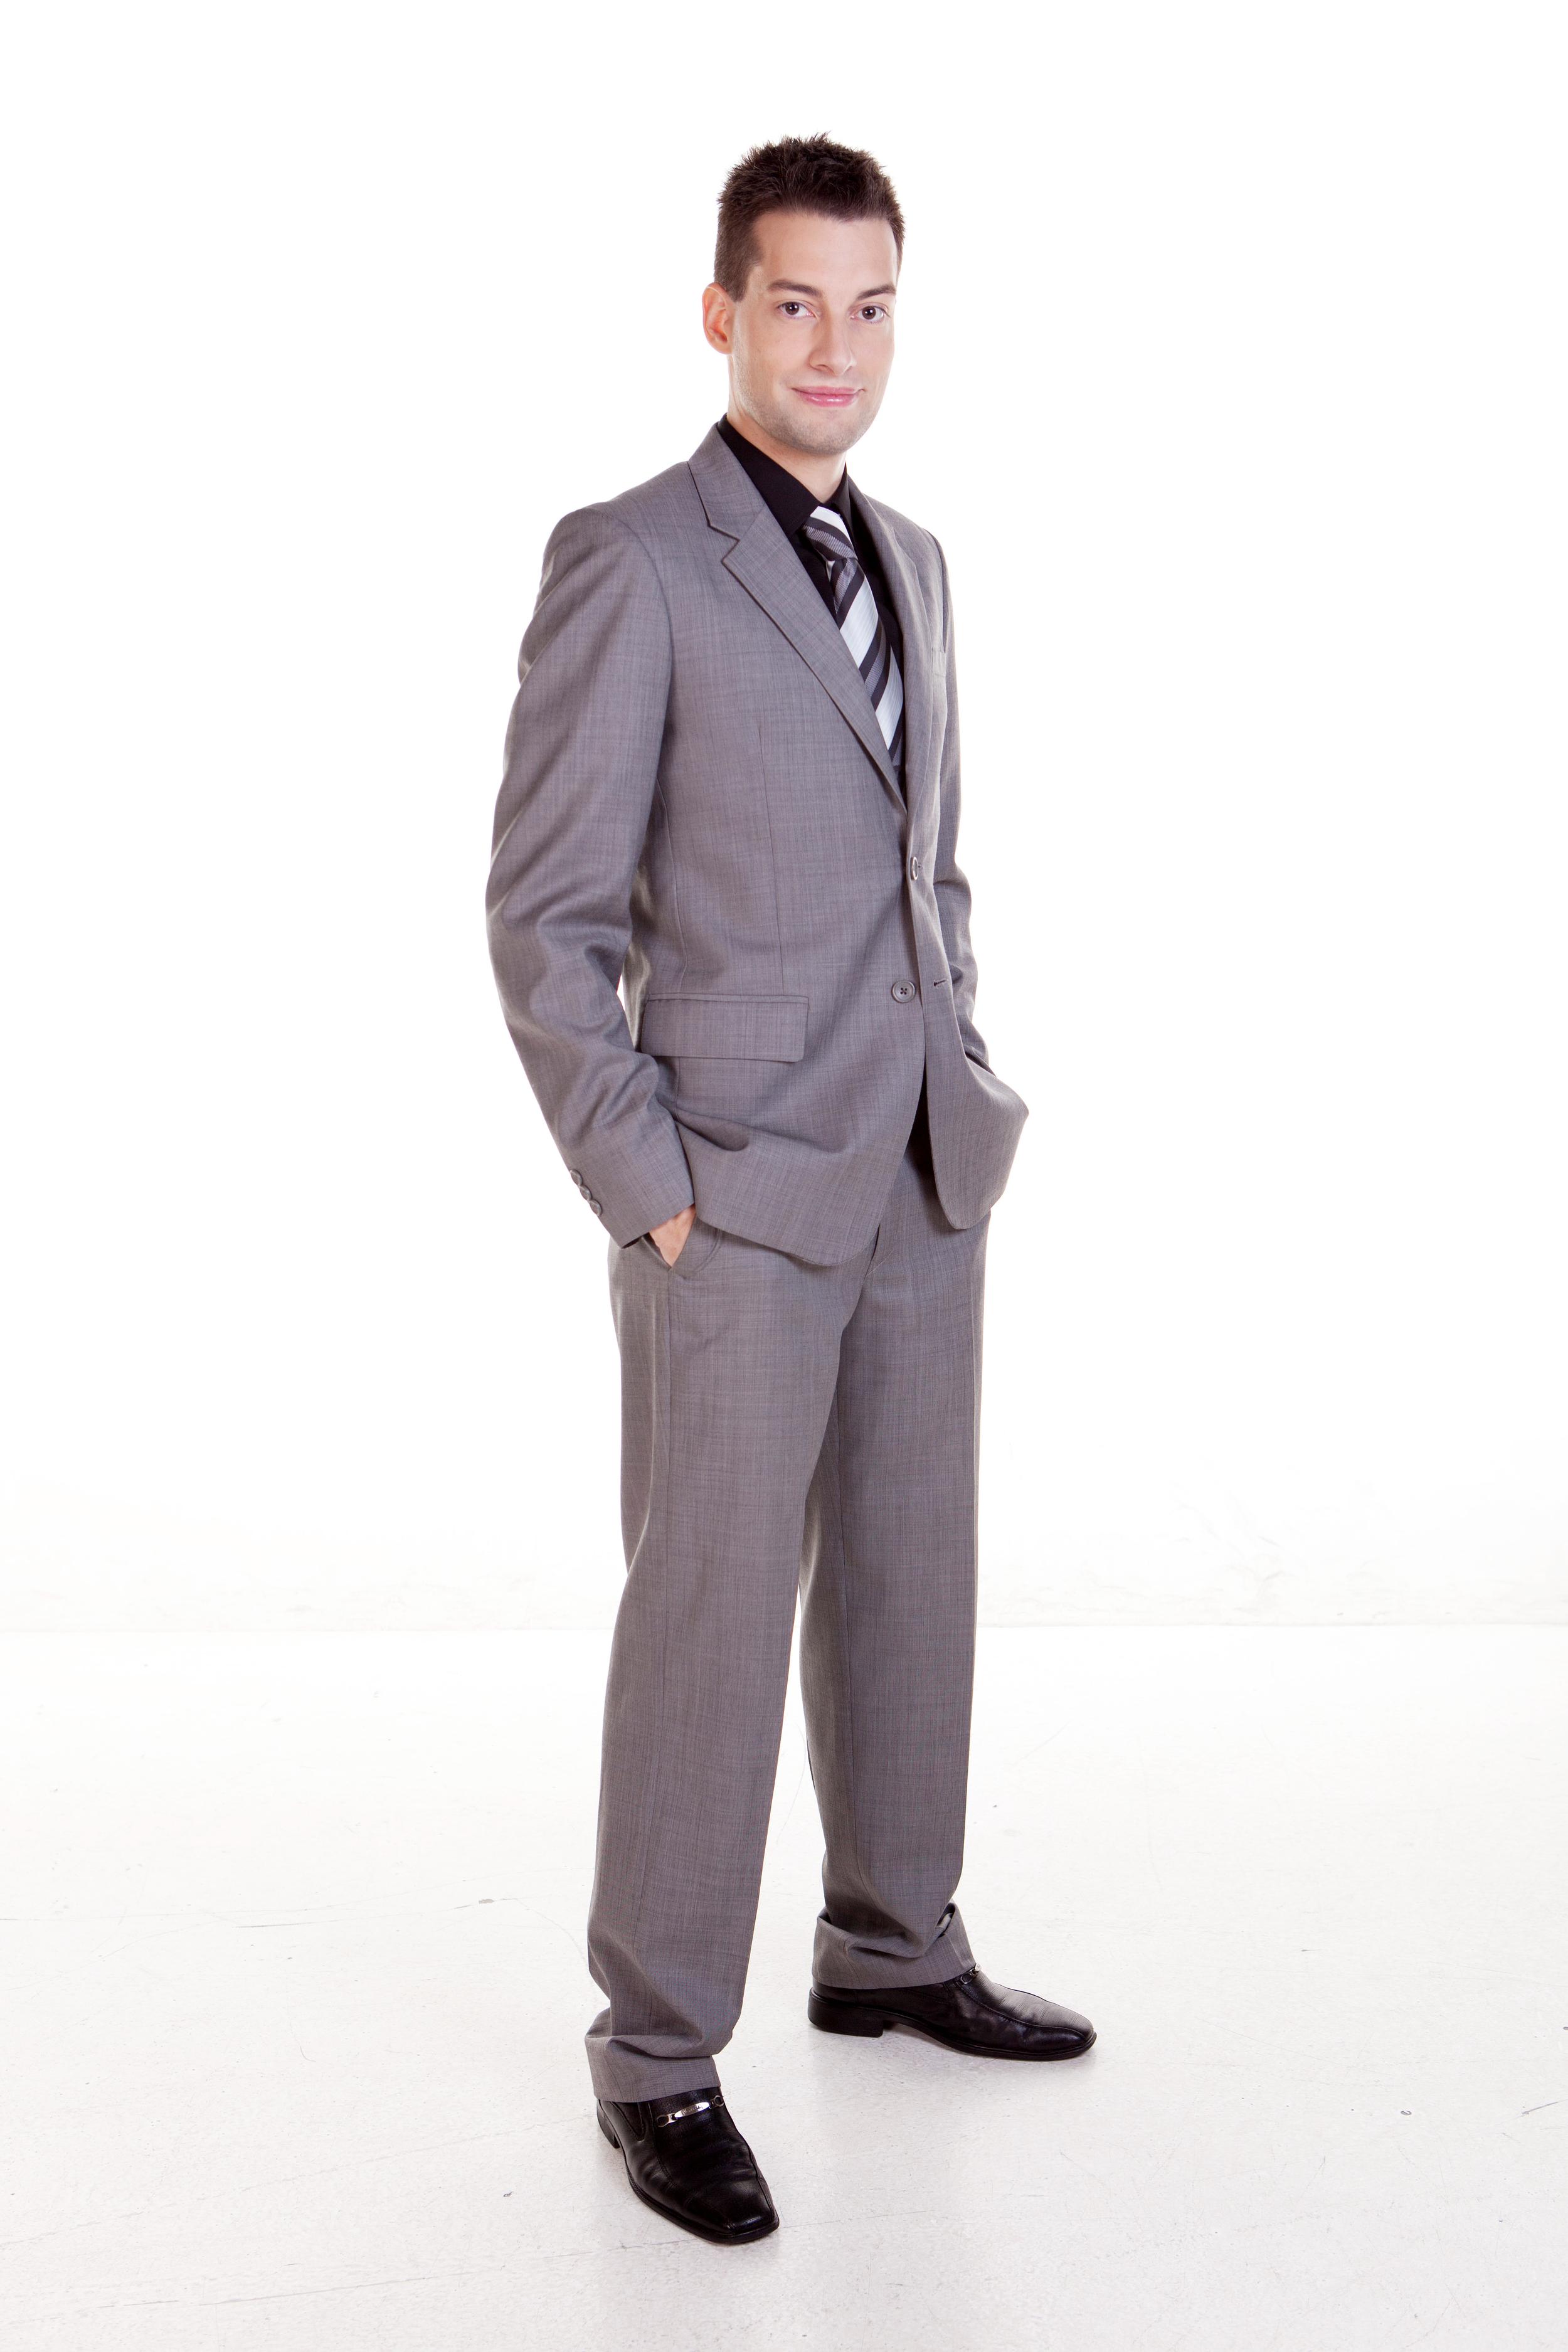 Jerry Koedding - Full Body Professional.jpg